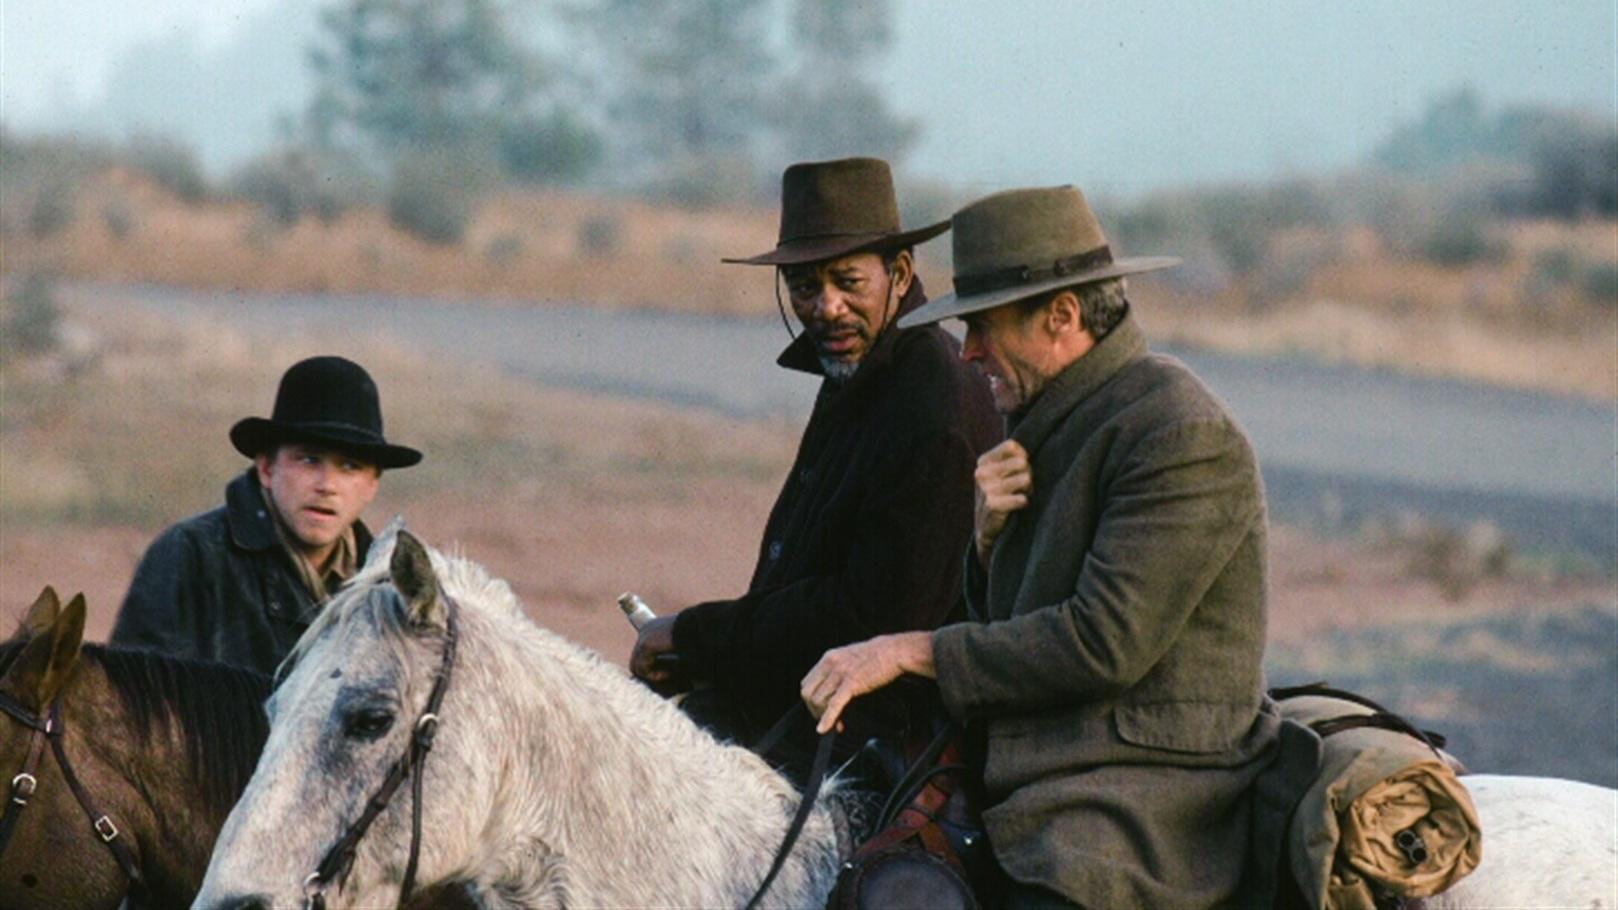 #5) Unforgiven - (1992 - dir. Clint Eastwood)